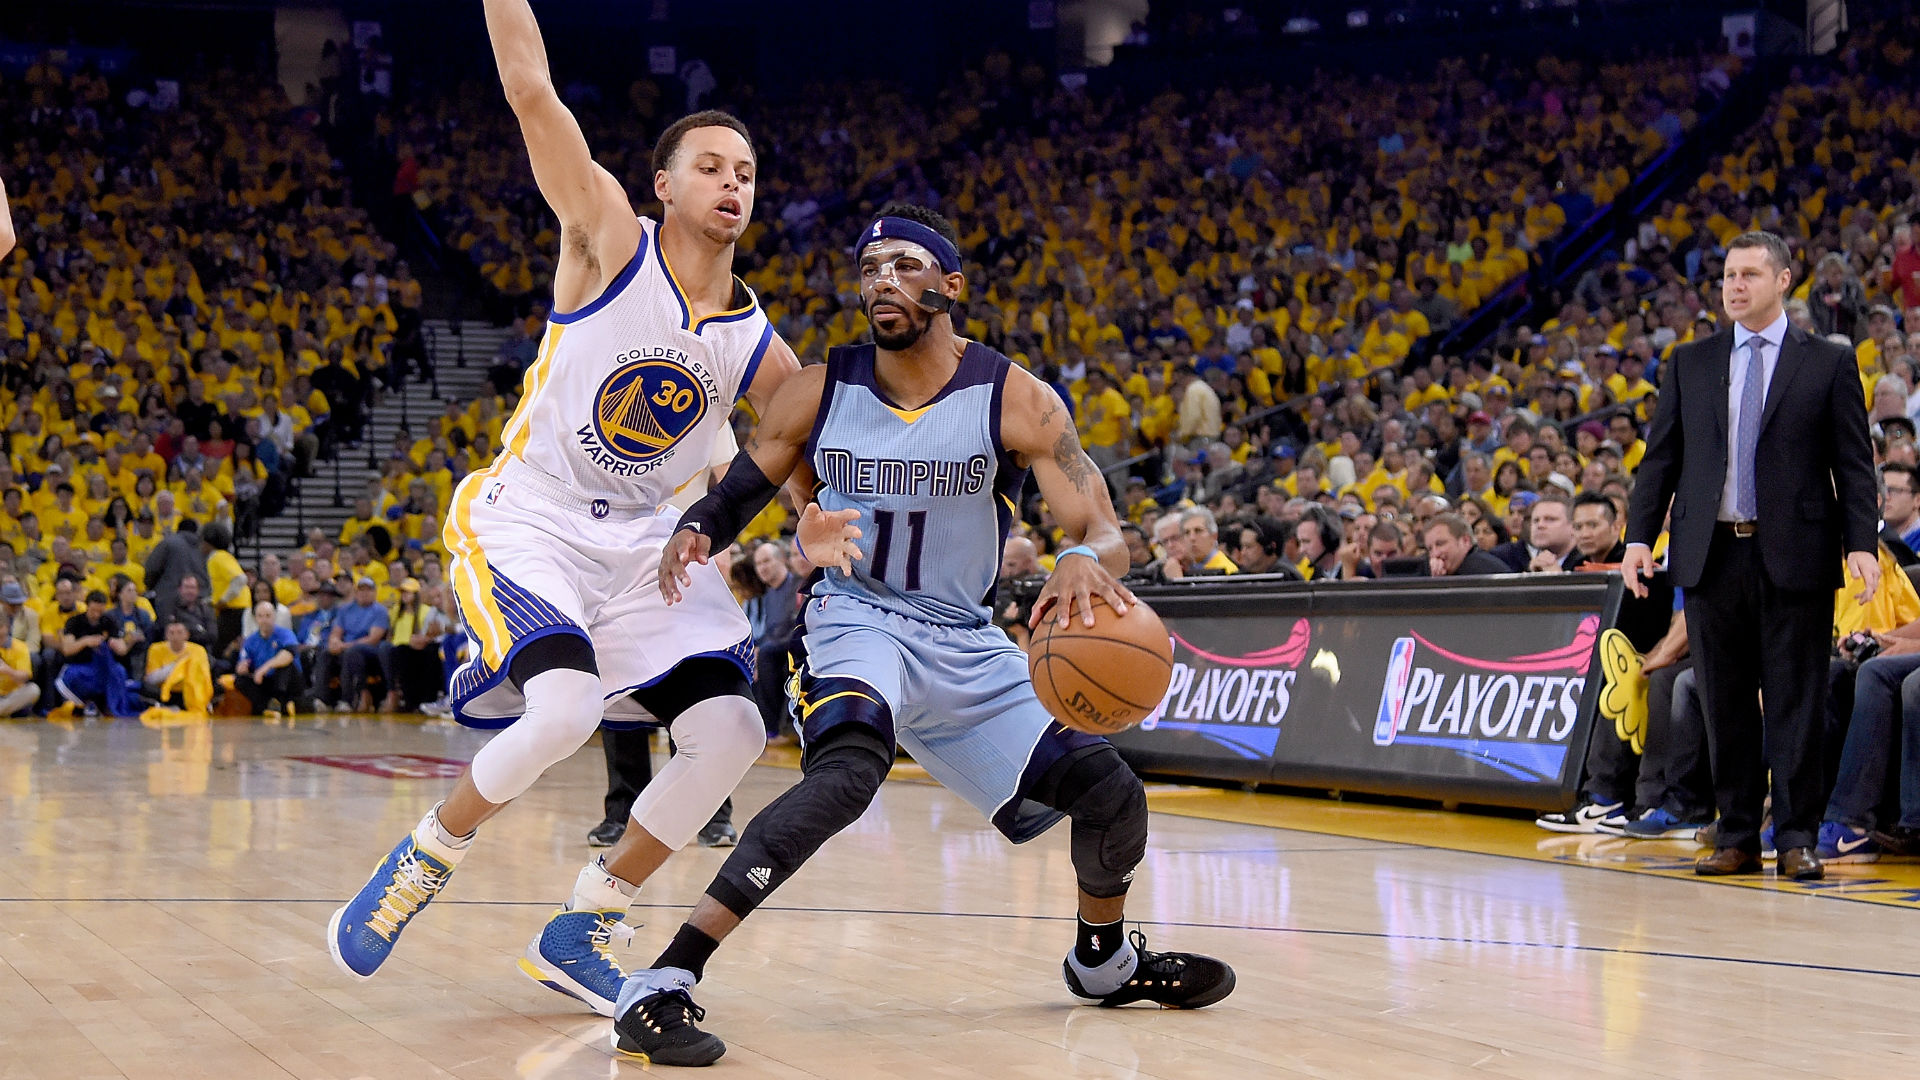 Mike Conley's return keys Grizzlies' Game 2 win over Warriors